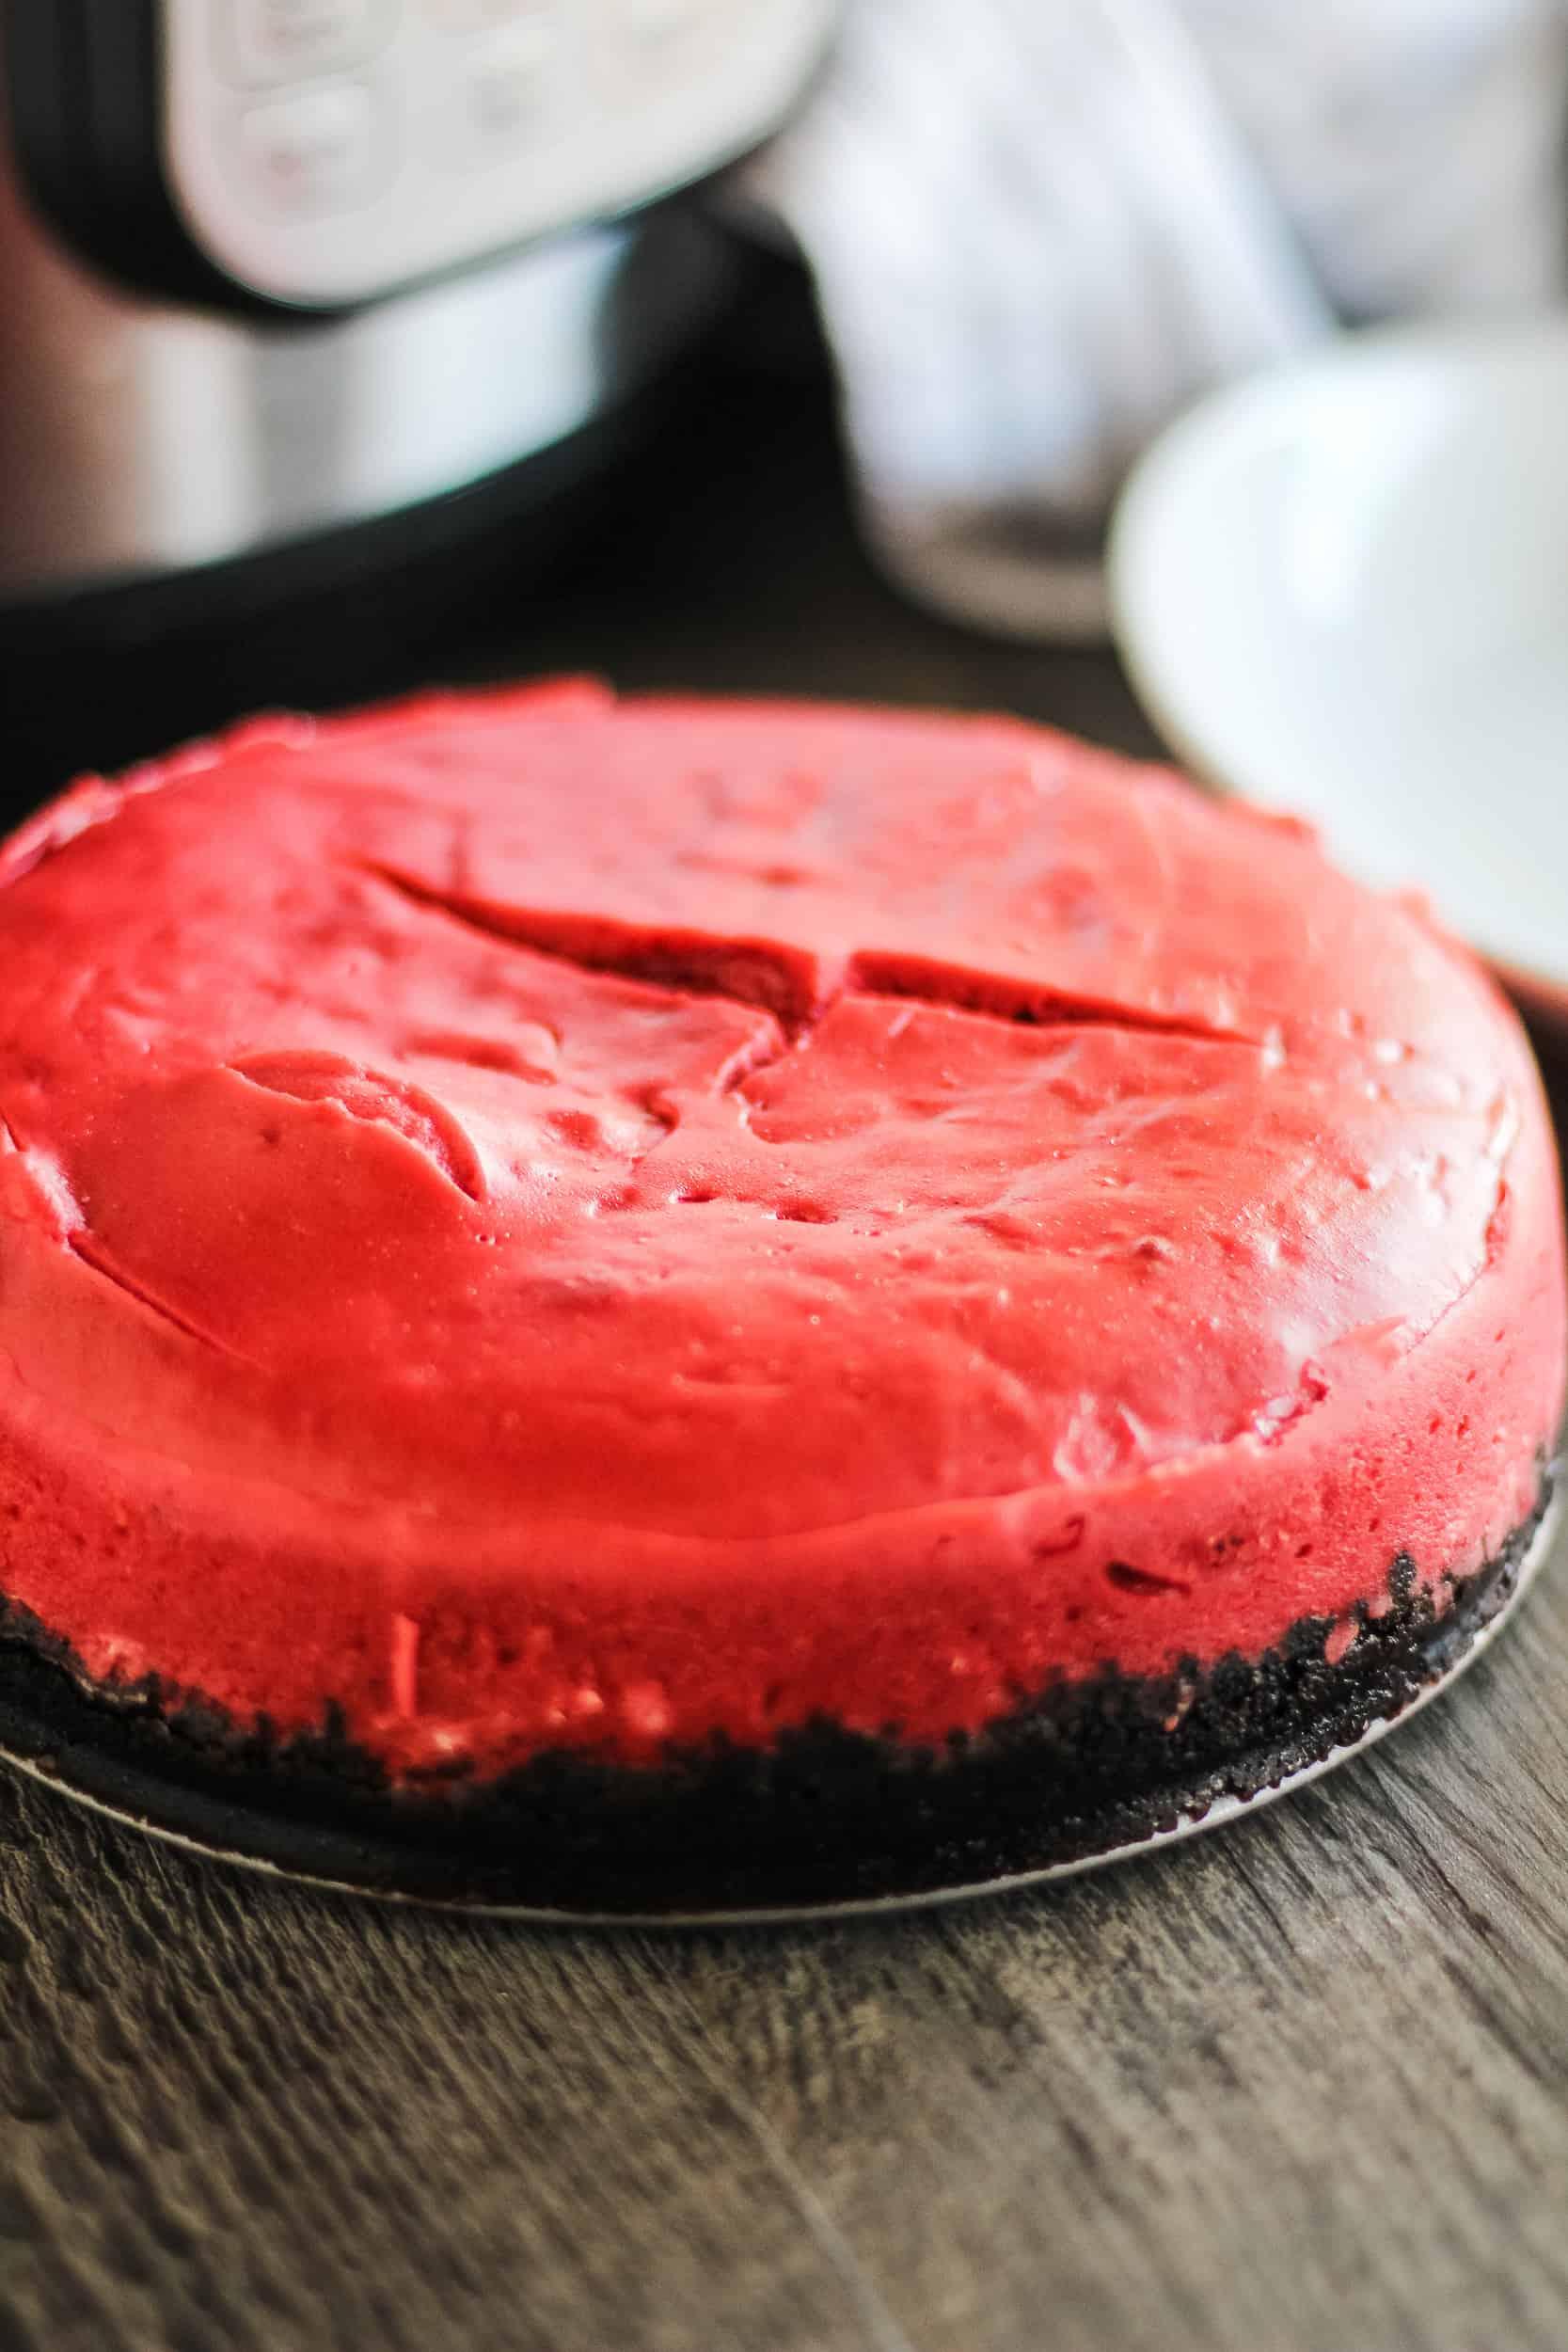 red velvet cheesecake cooling on dark wood table